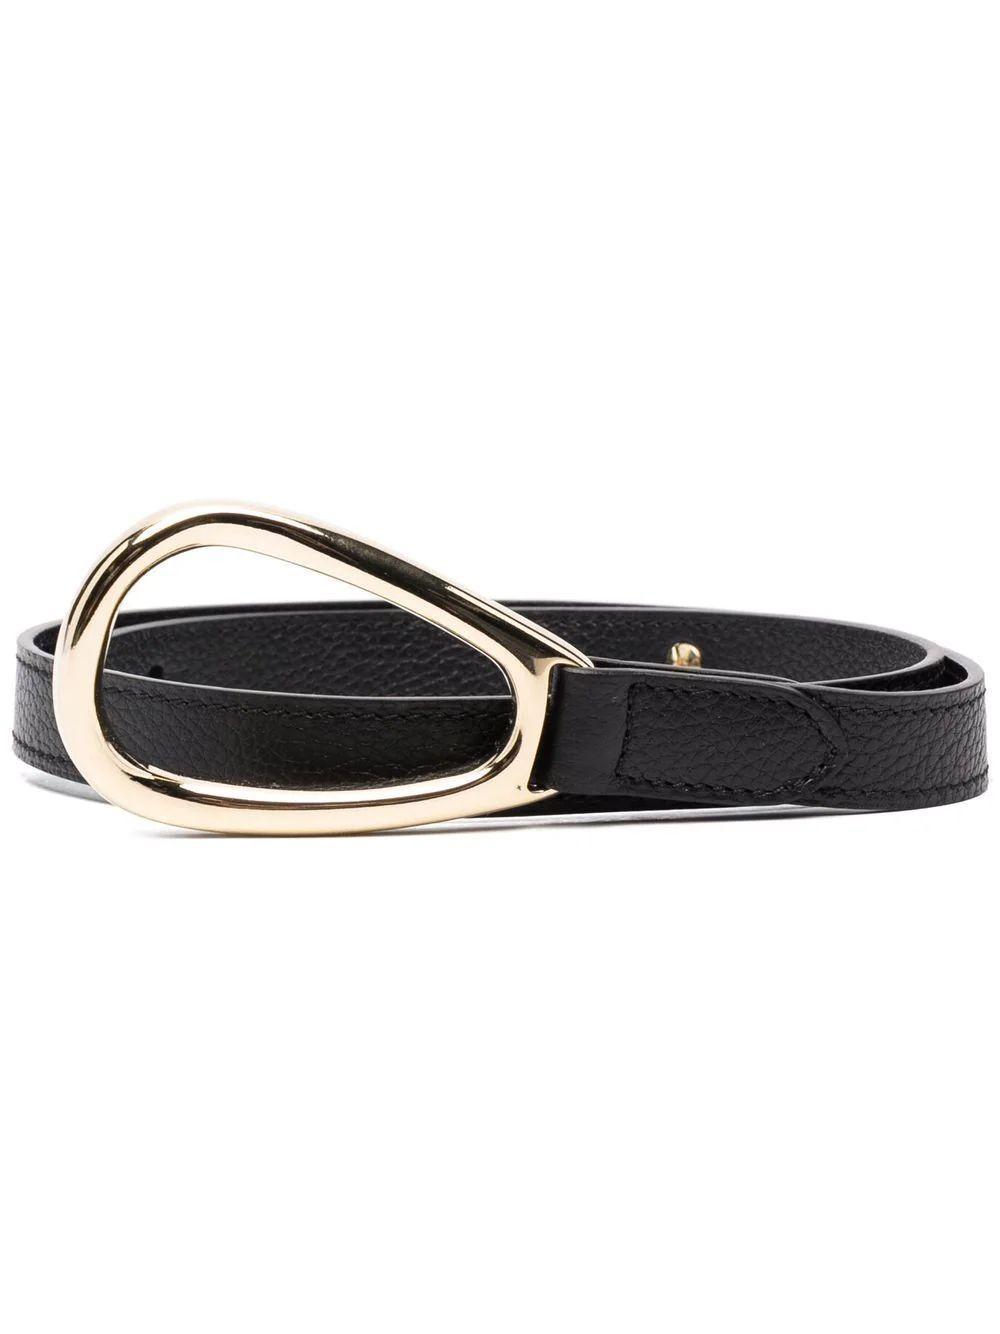 L ' Adorable Skinny Belt Item # MV38